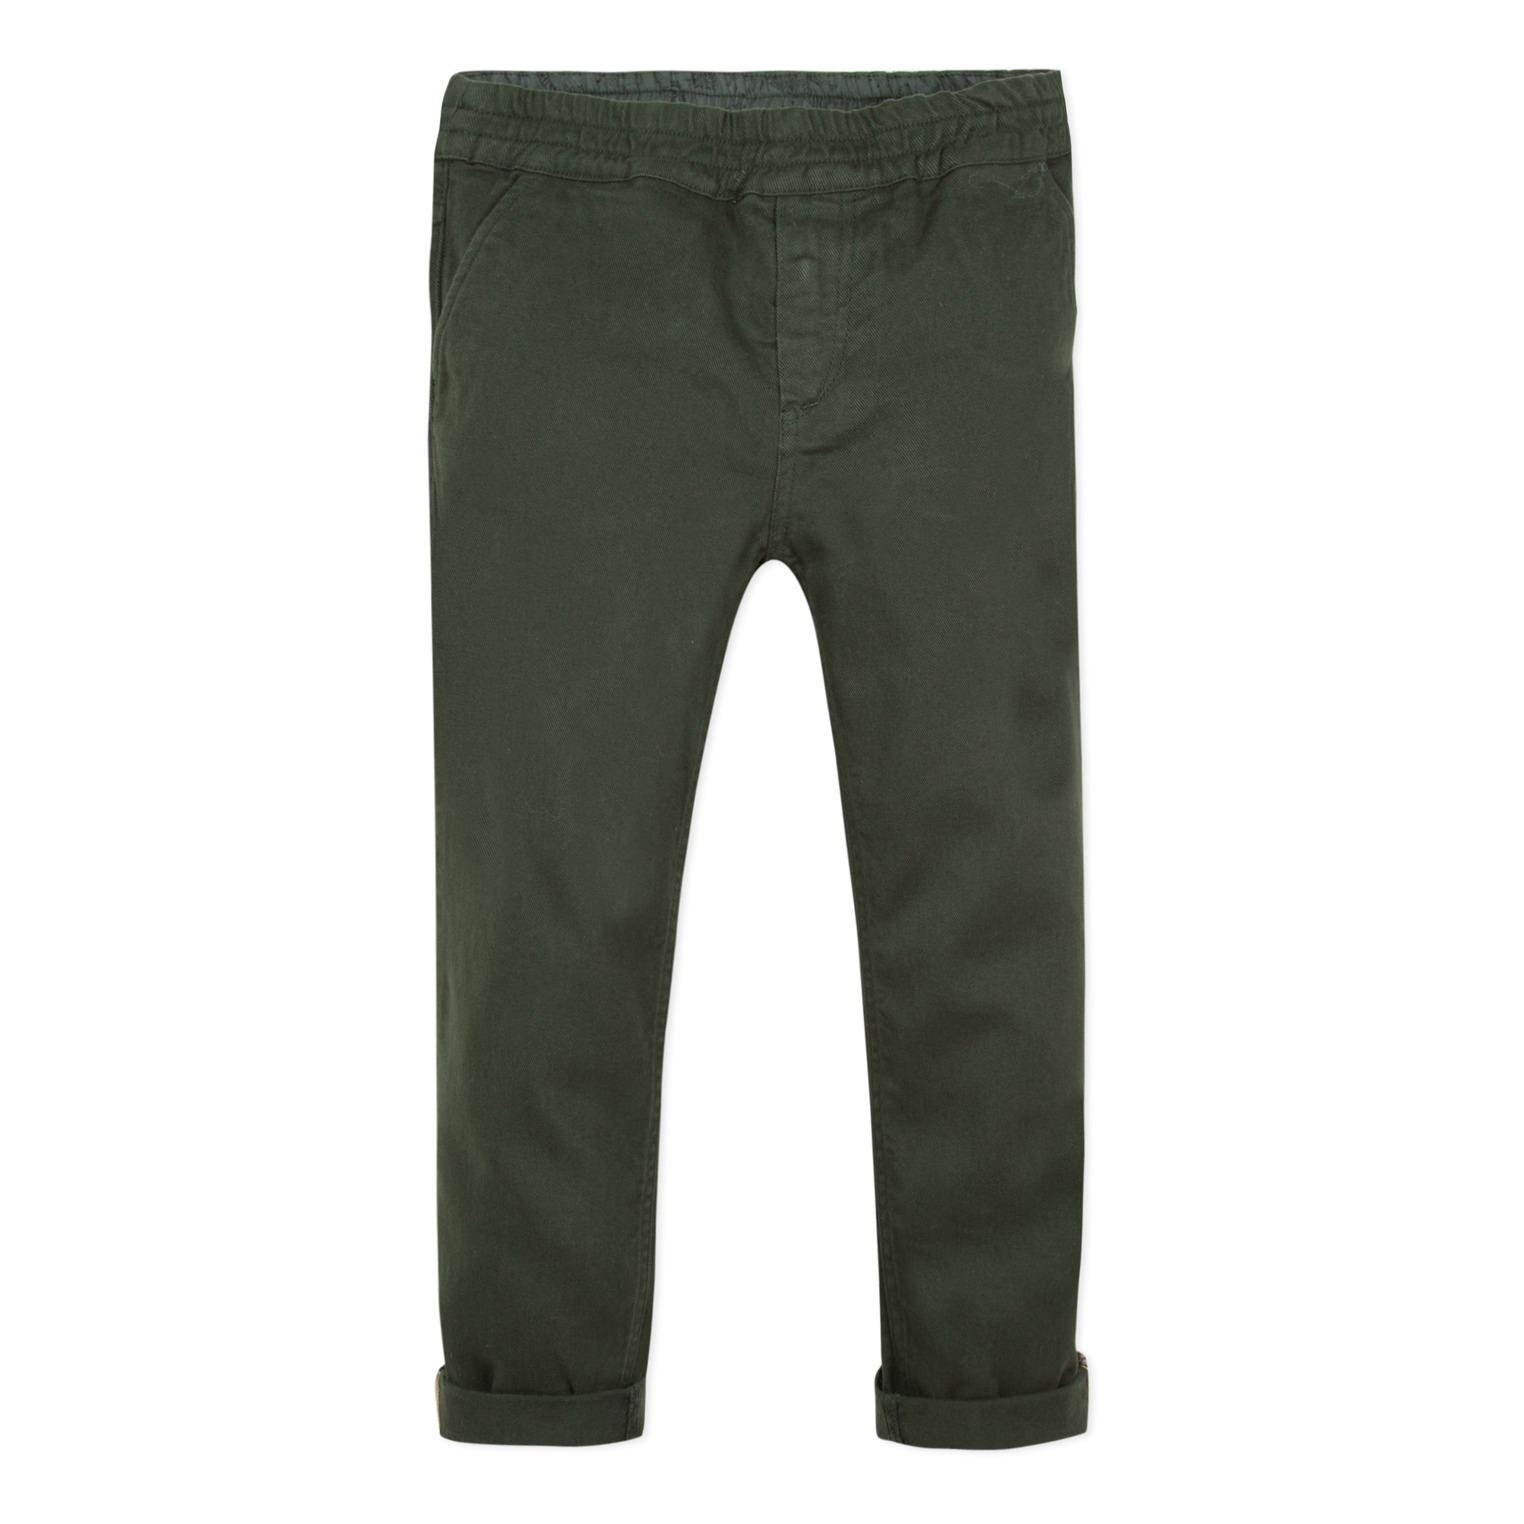 Pantalon Ceinture Elastique